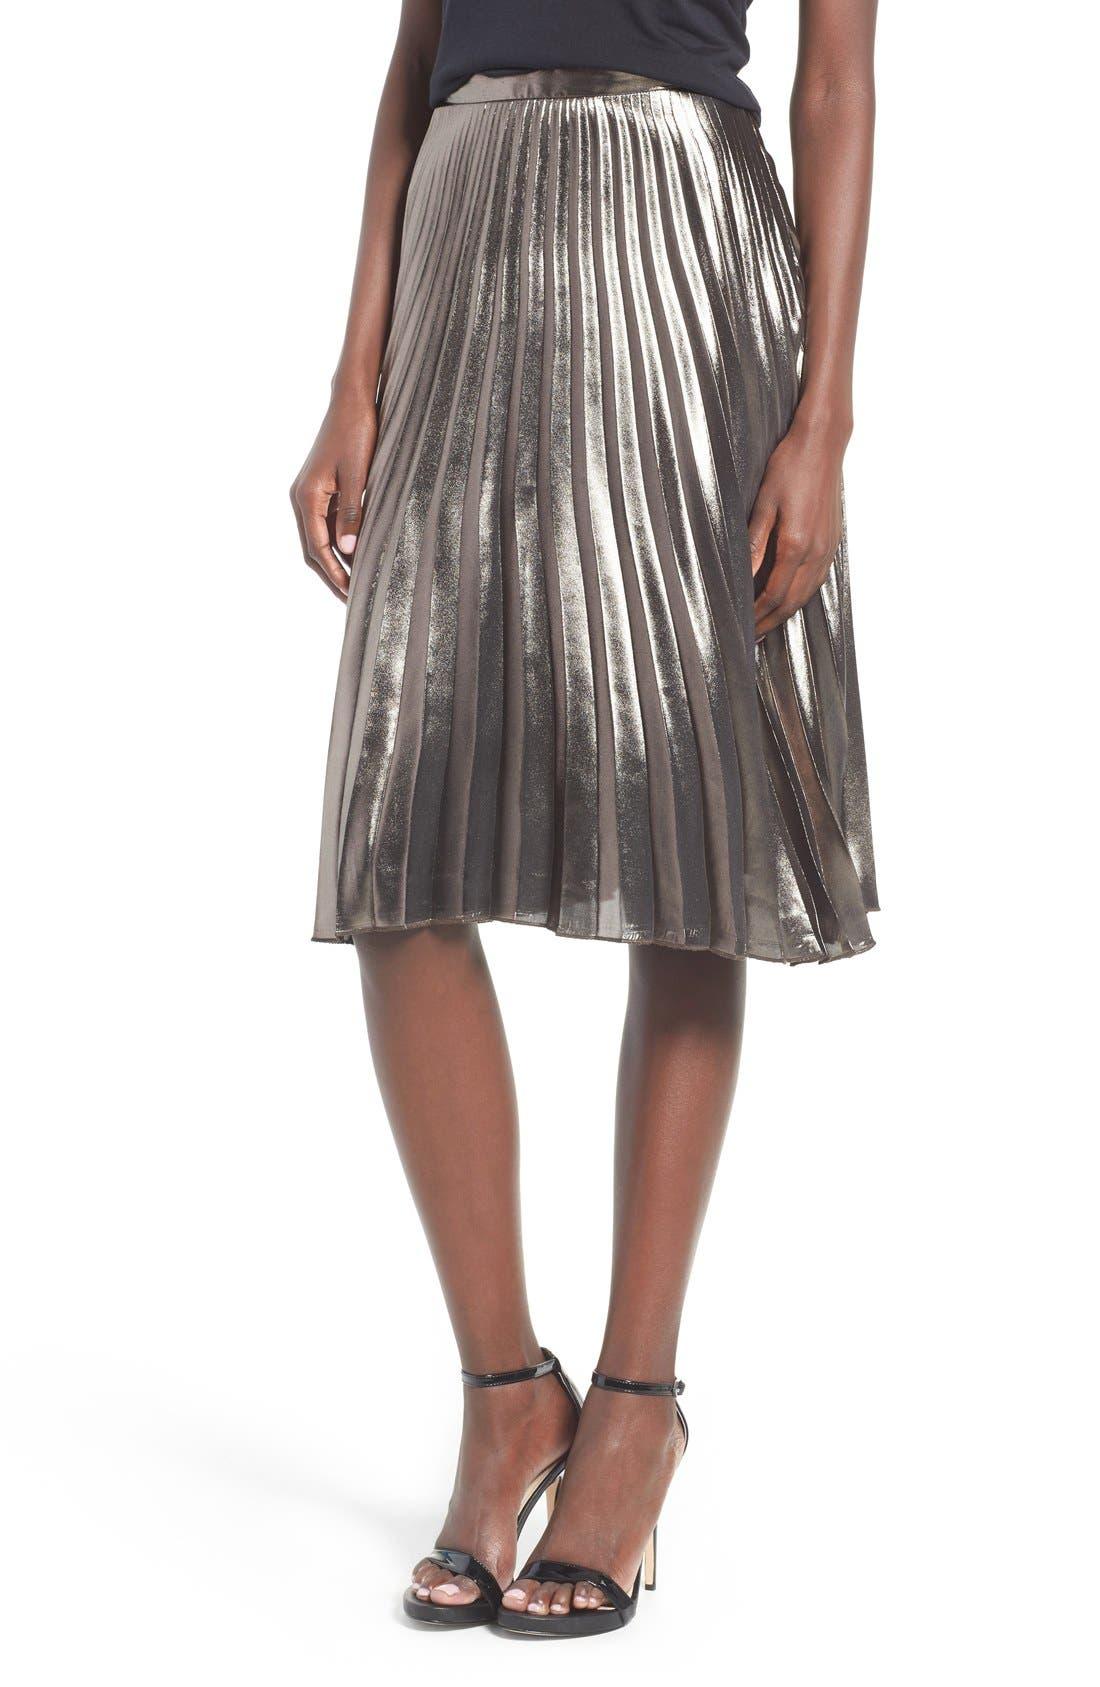 ASTR THE LABEL ASTR Celeste Pleated Skirt, Main, color, 224